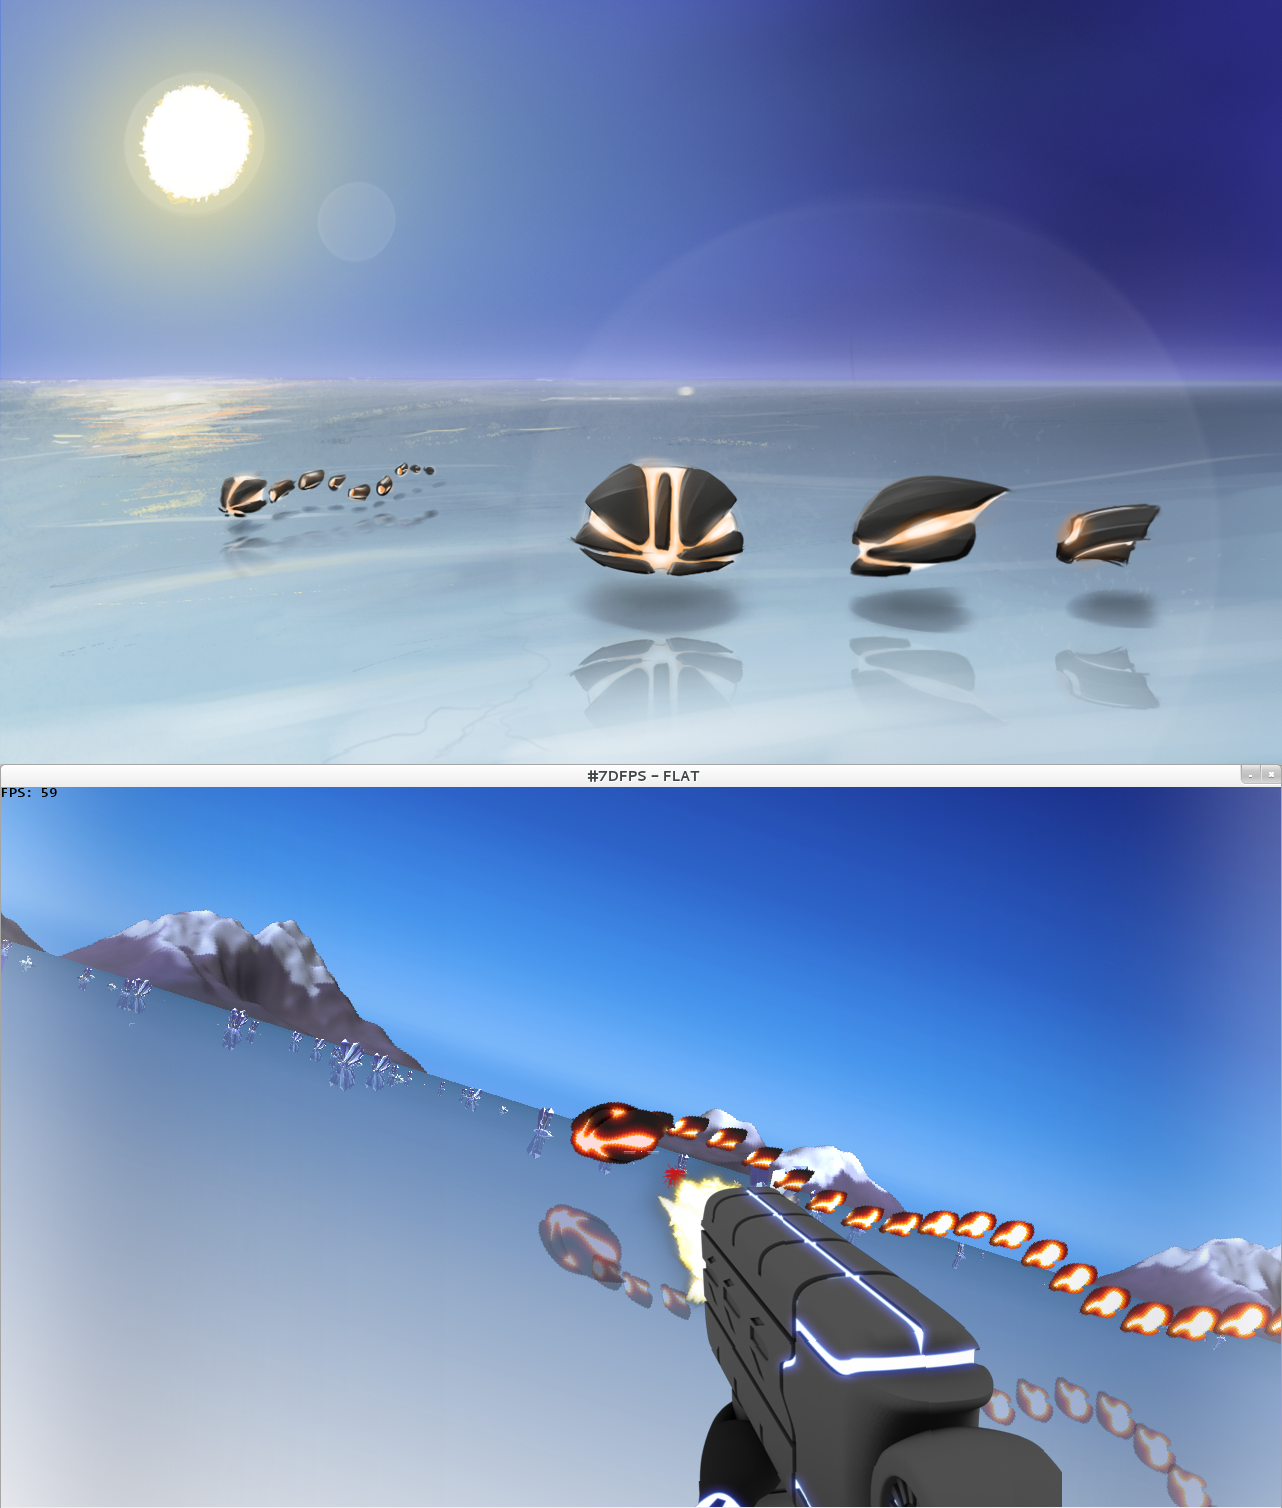 FLAT Concept Art - Pulse Dragon (7dfps 2012) by jo-shadow